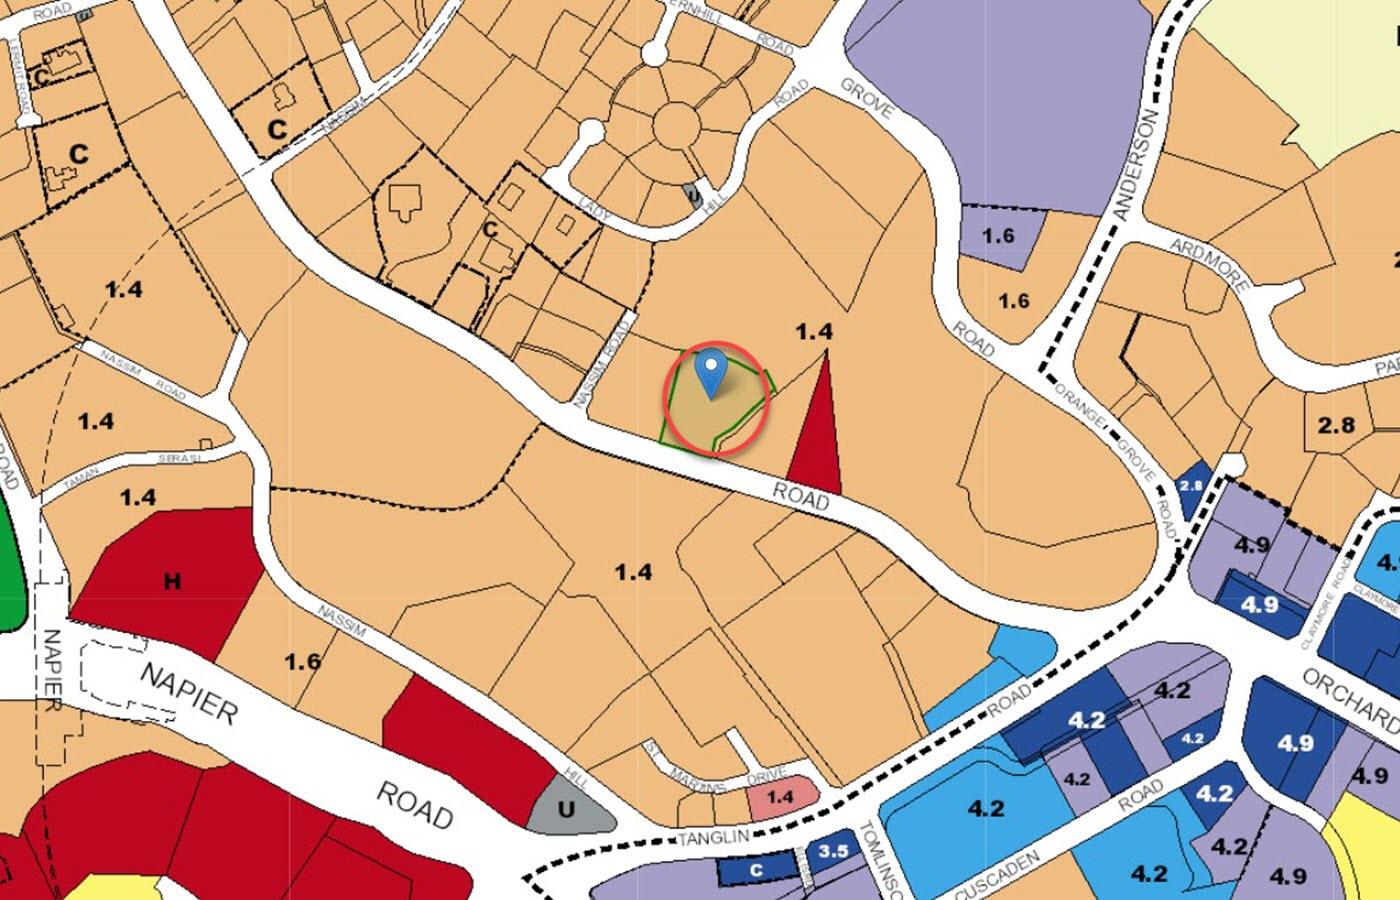 LES Maisons Nassim Condo Location - URA Master Plan Map